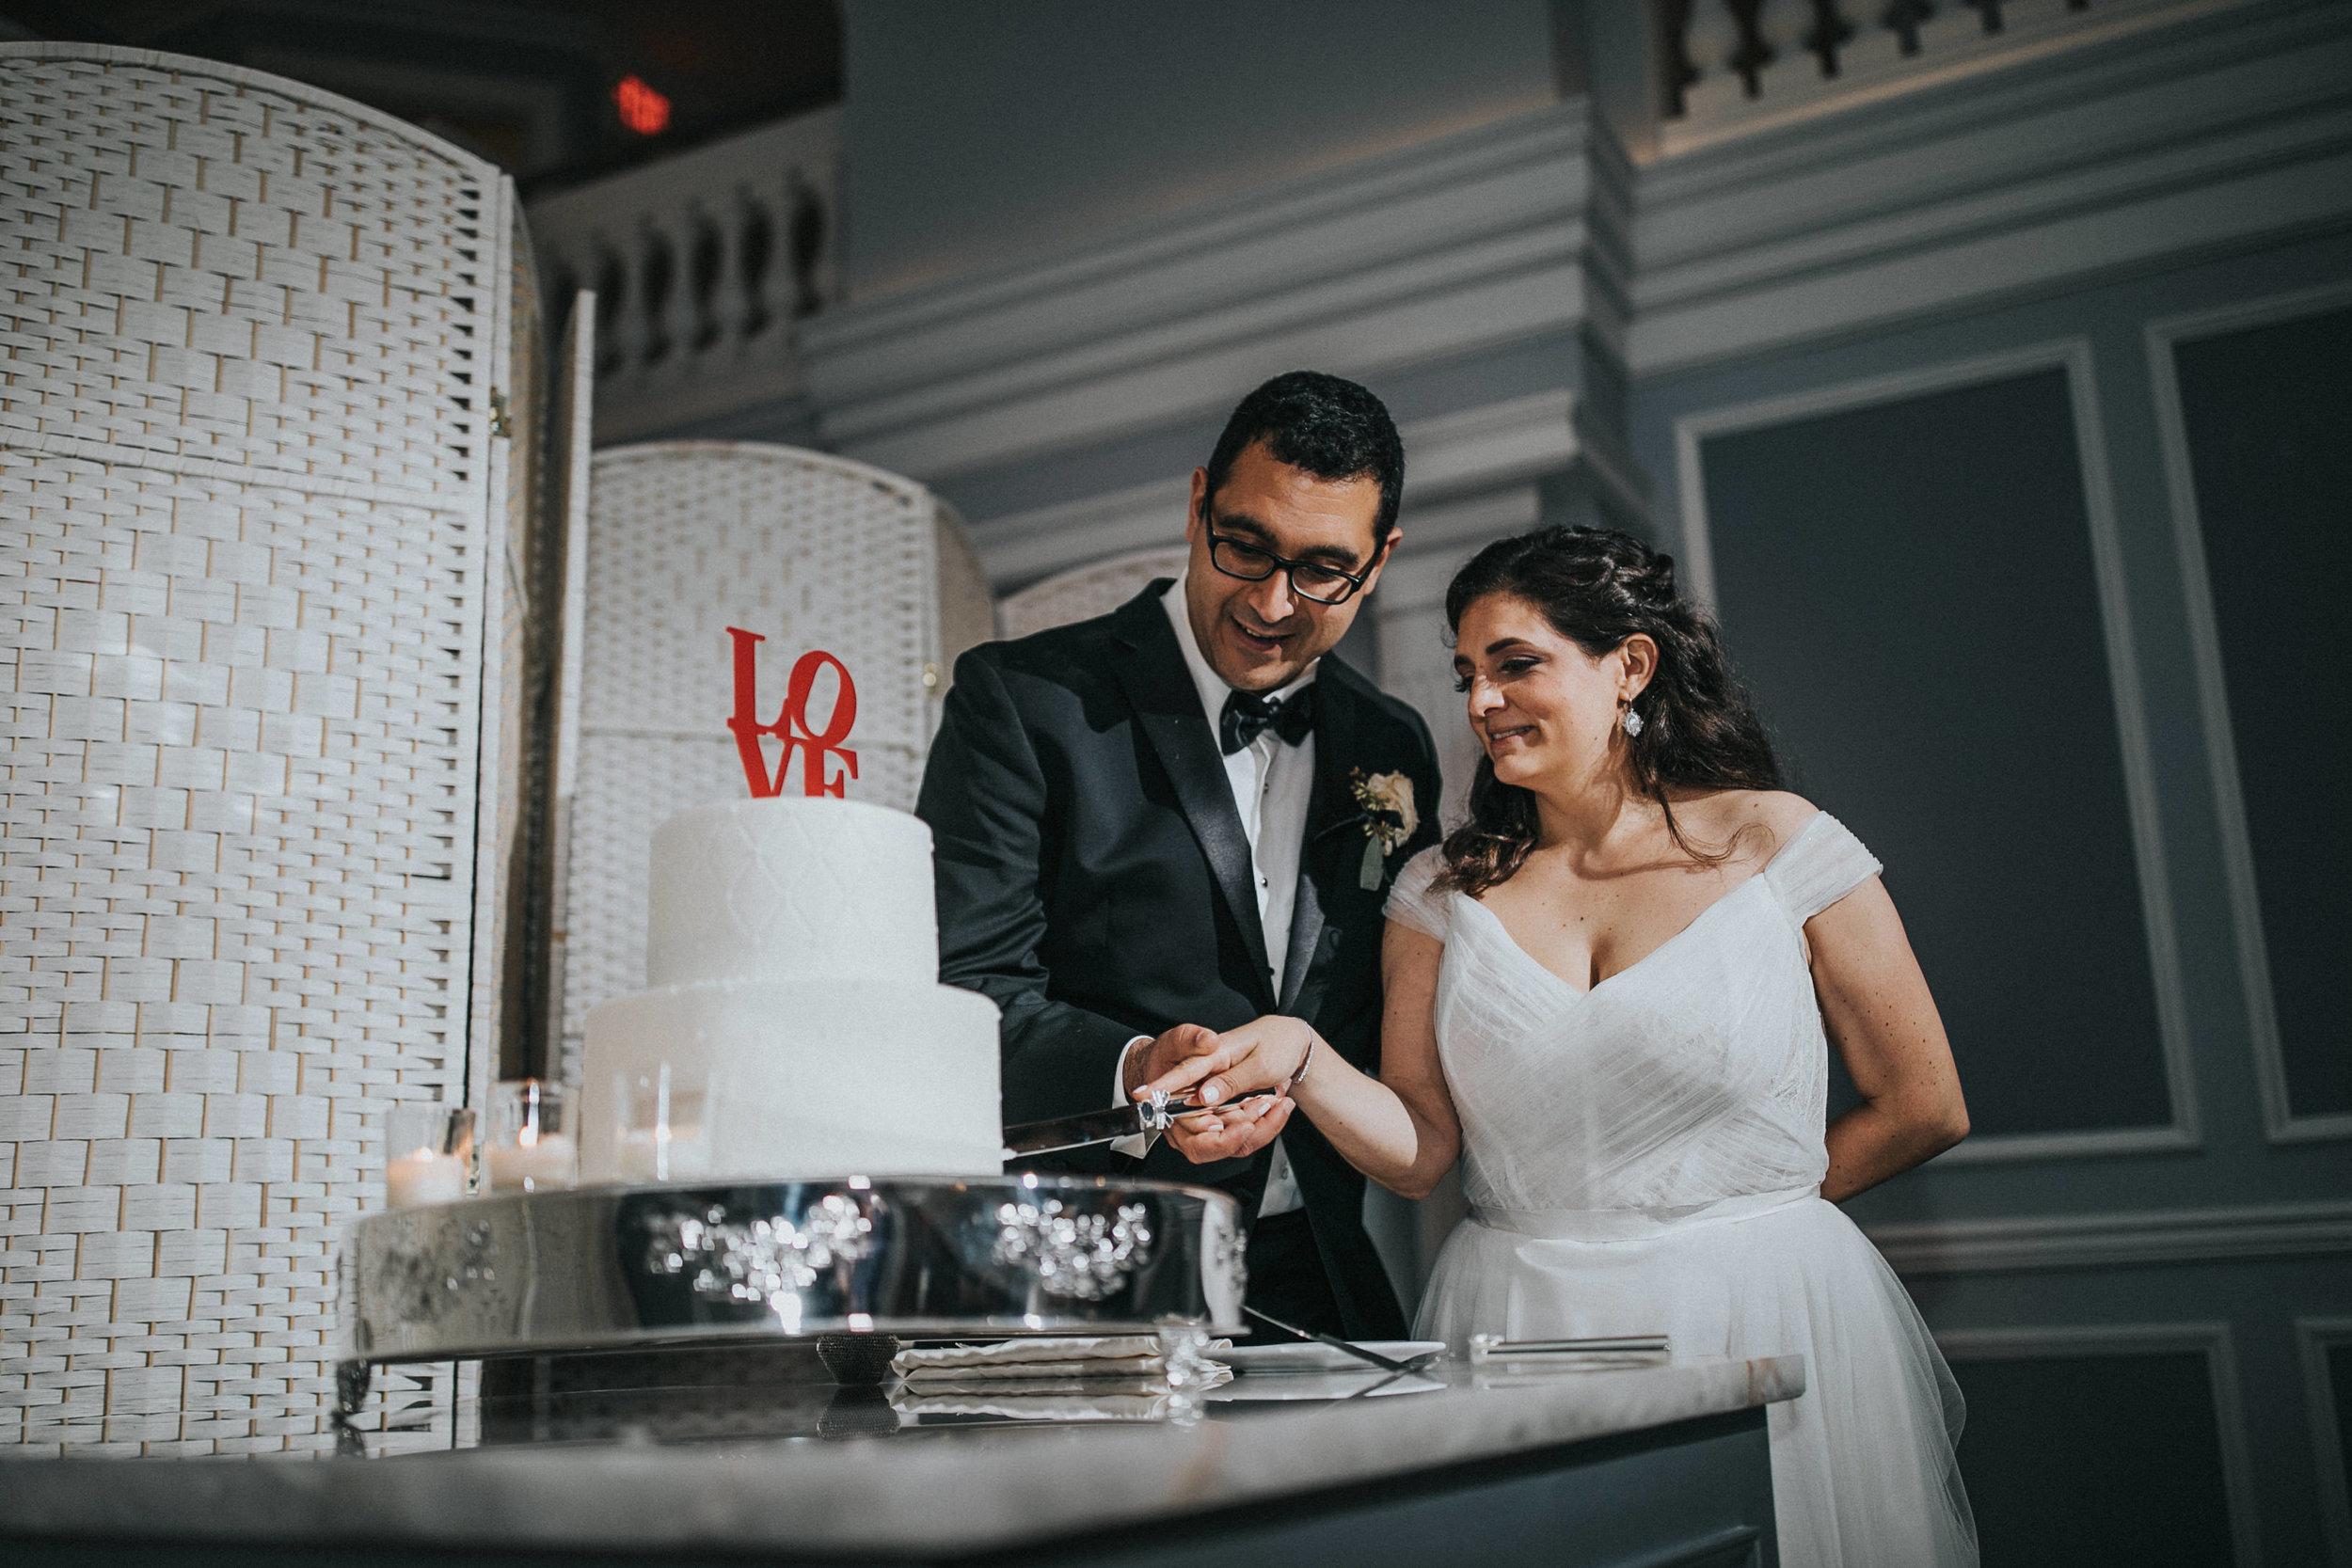 JennaLynnPhotography-NJWeddingPhotographer-Philadelphia-Wedding-ArtsBallroom-Reception-188.jpg